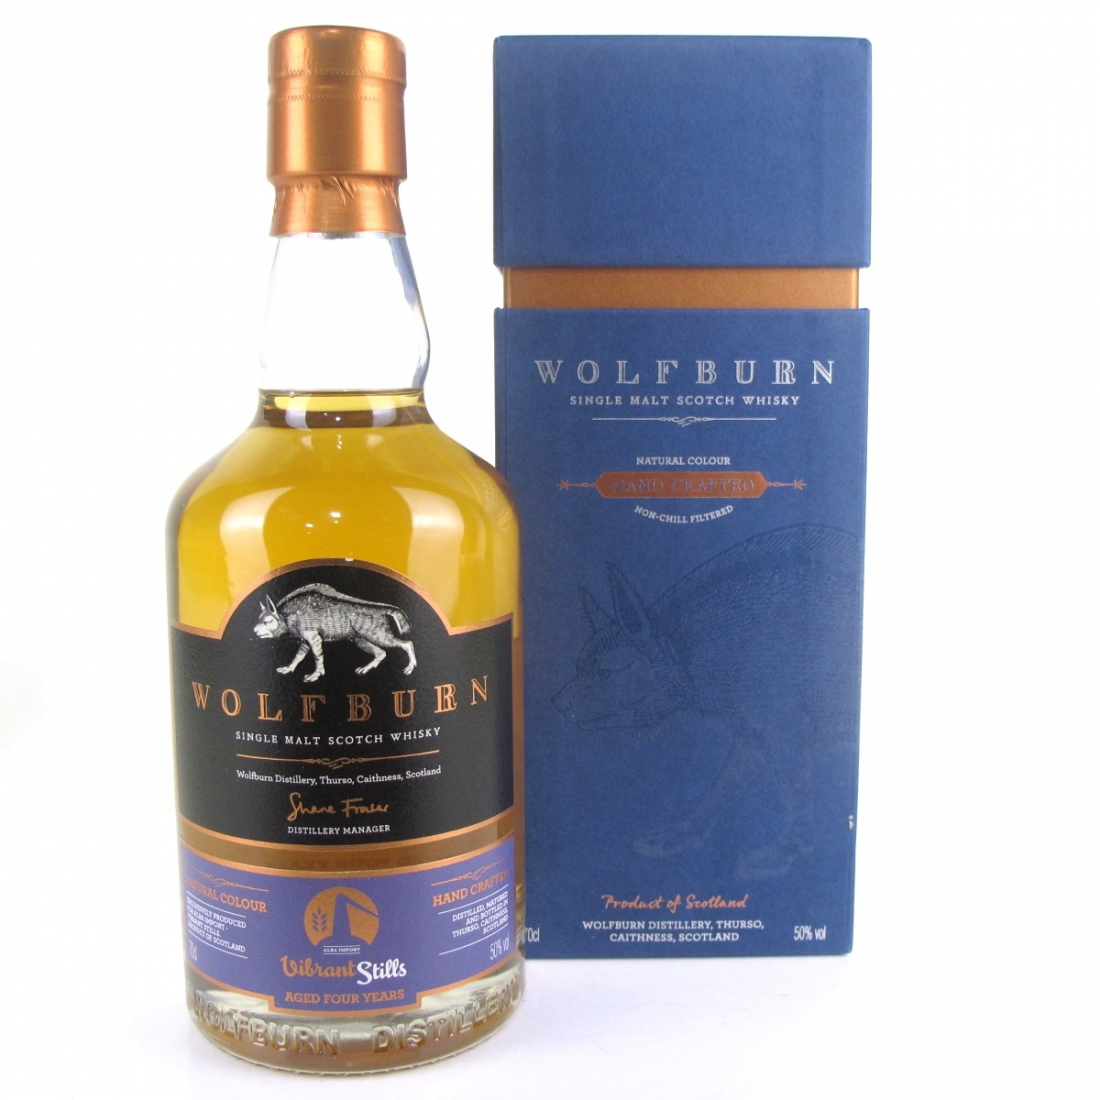 Wolfburn Vibrant Stills 10th Anniversary of Alba Import